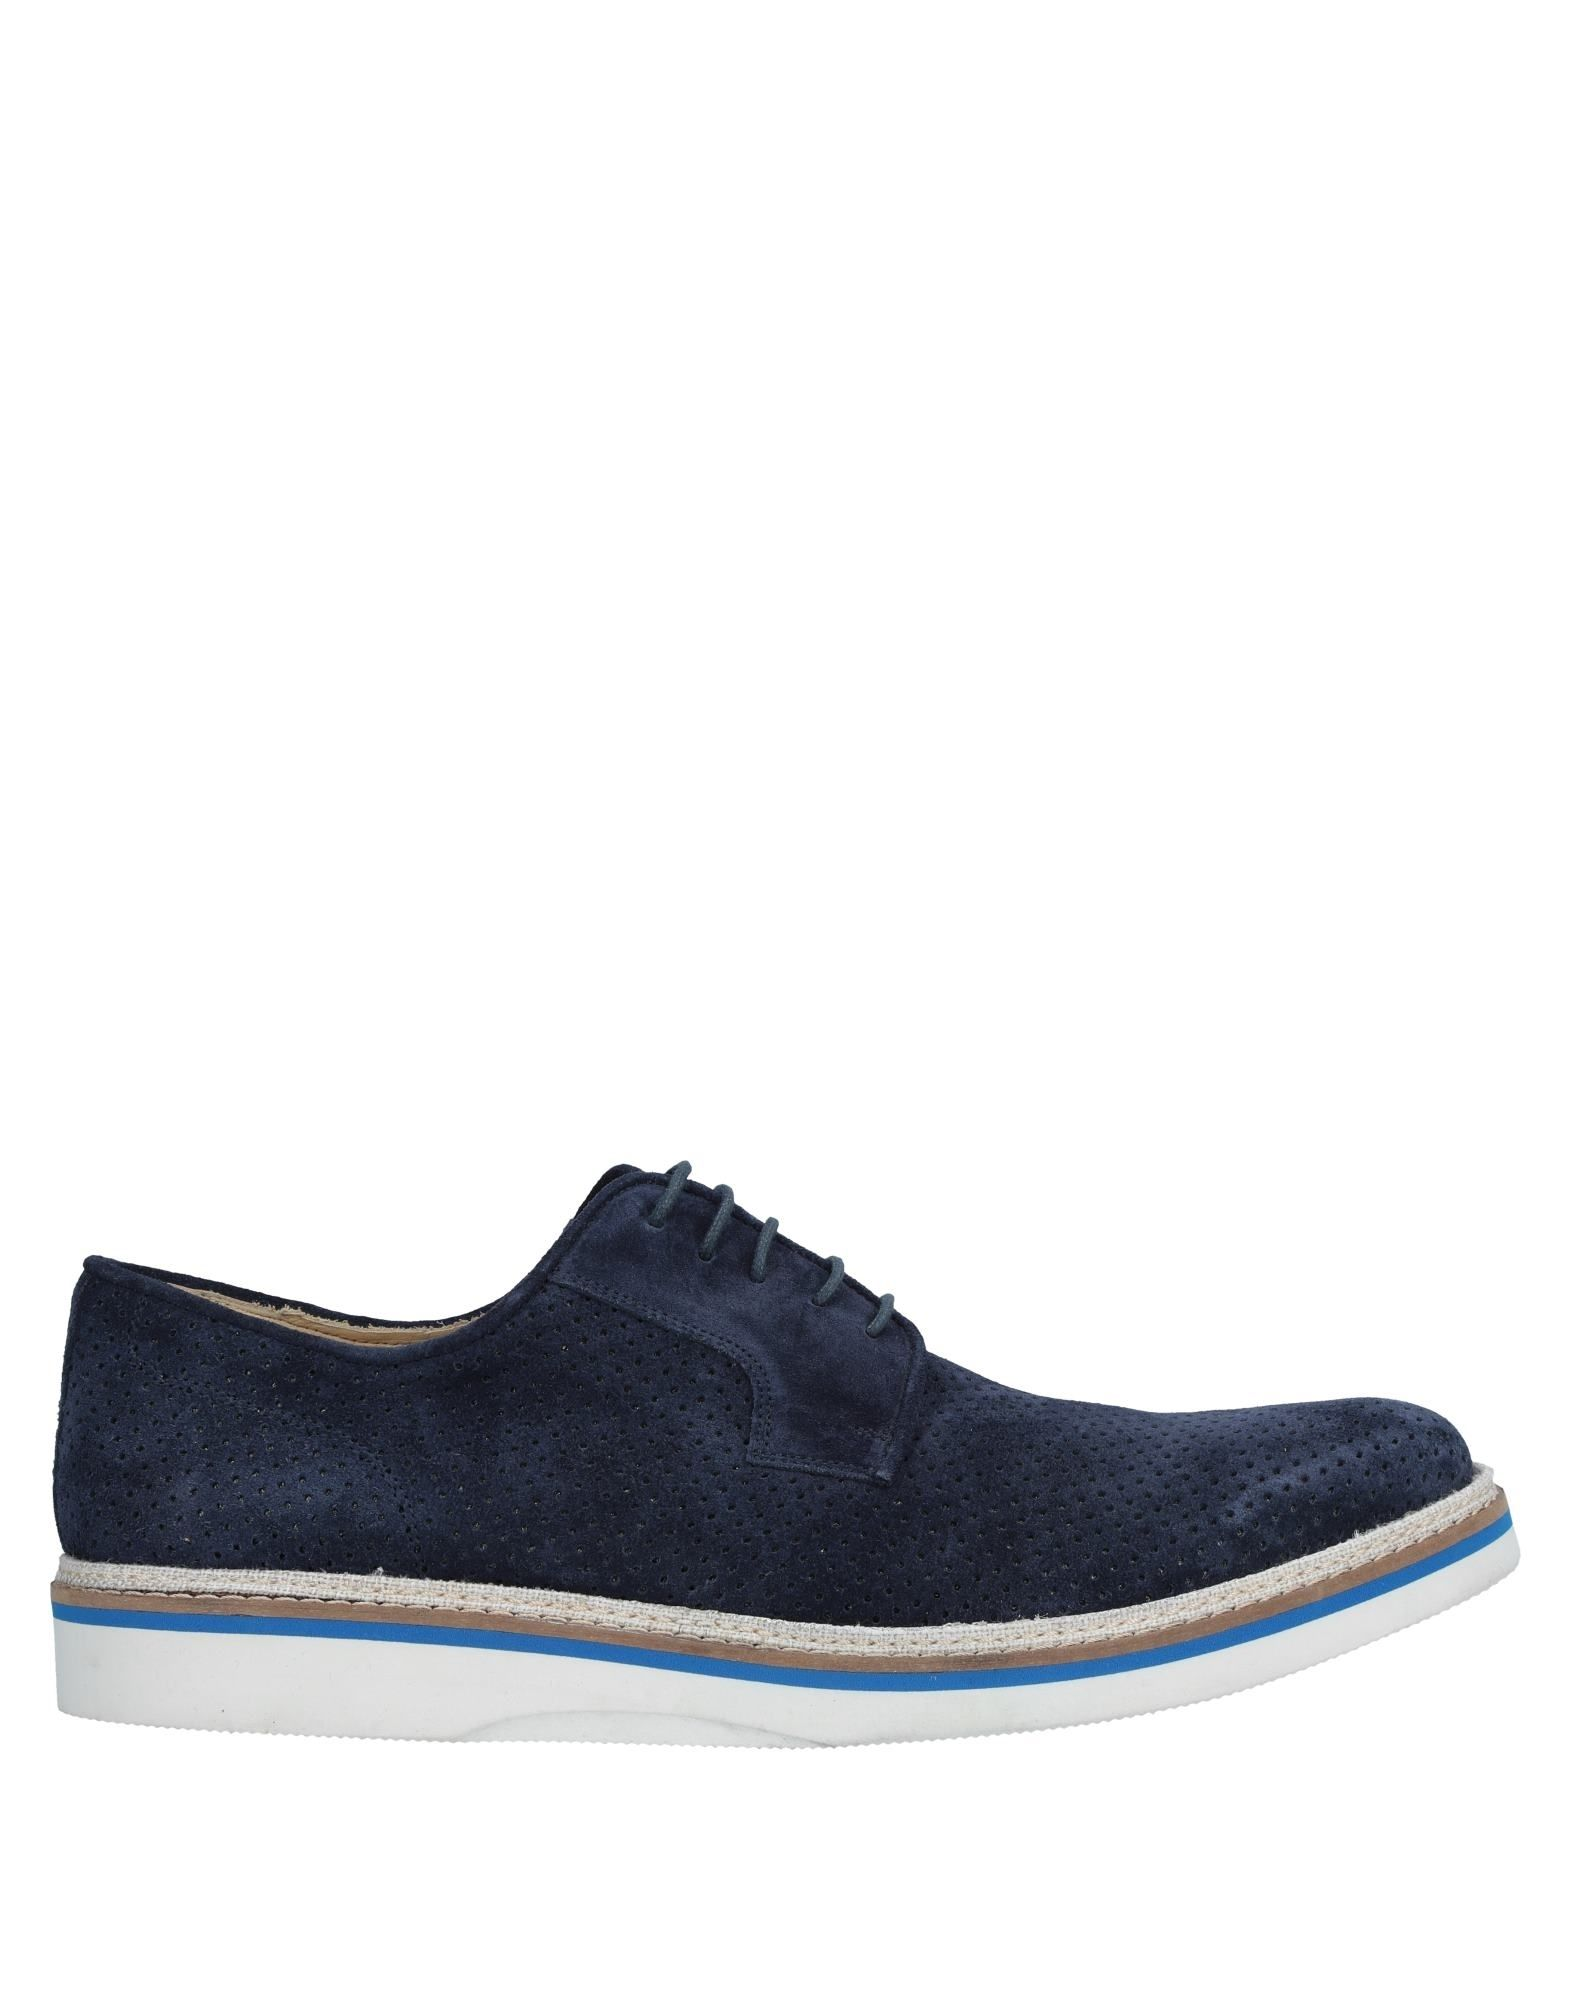 Rabatt echte Schuhe Gold Brothers Schnürschuhe Herren  11533622SI